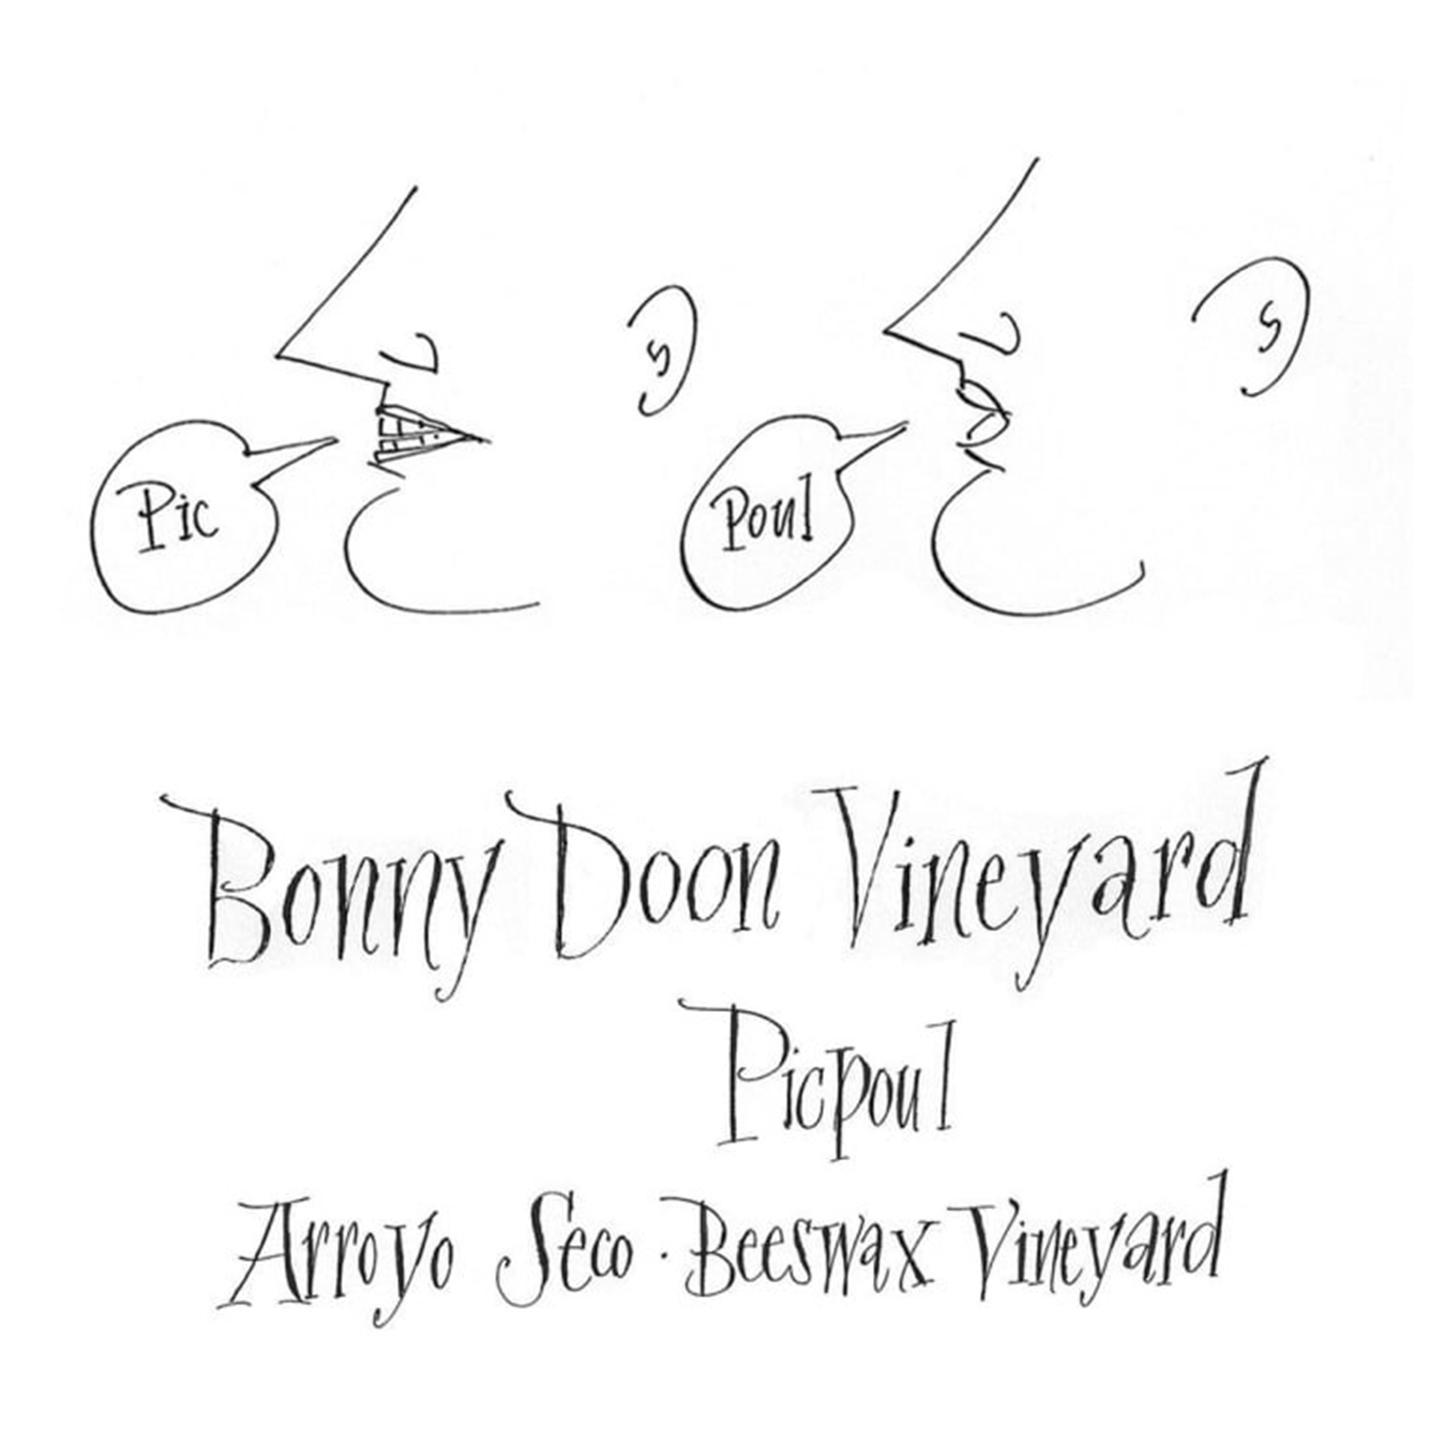 Bonny Doon Vineyard Picpoul Beeswax Vineyard Arroyo Secco 2019